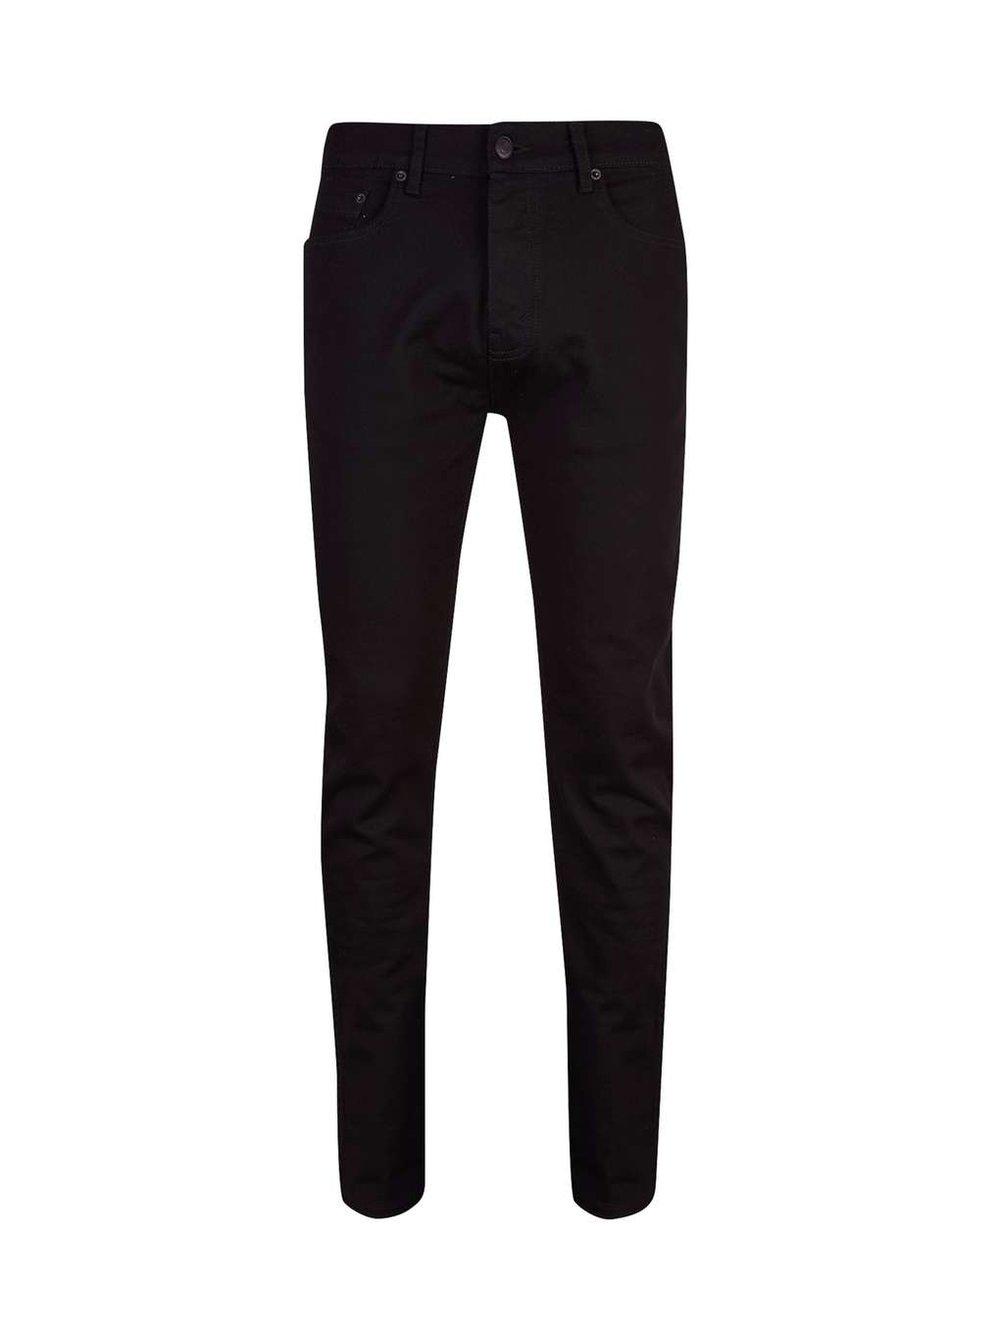 Black Jeans Burton.jpg